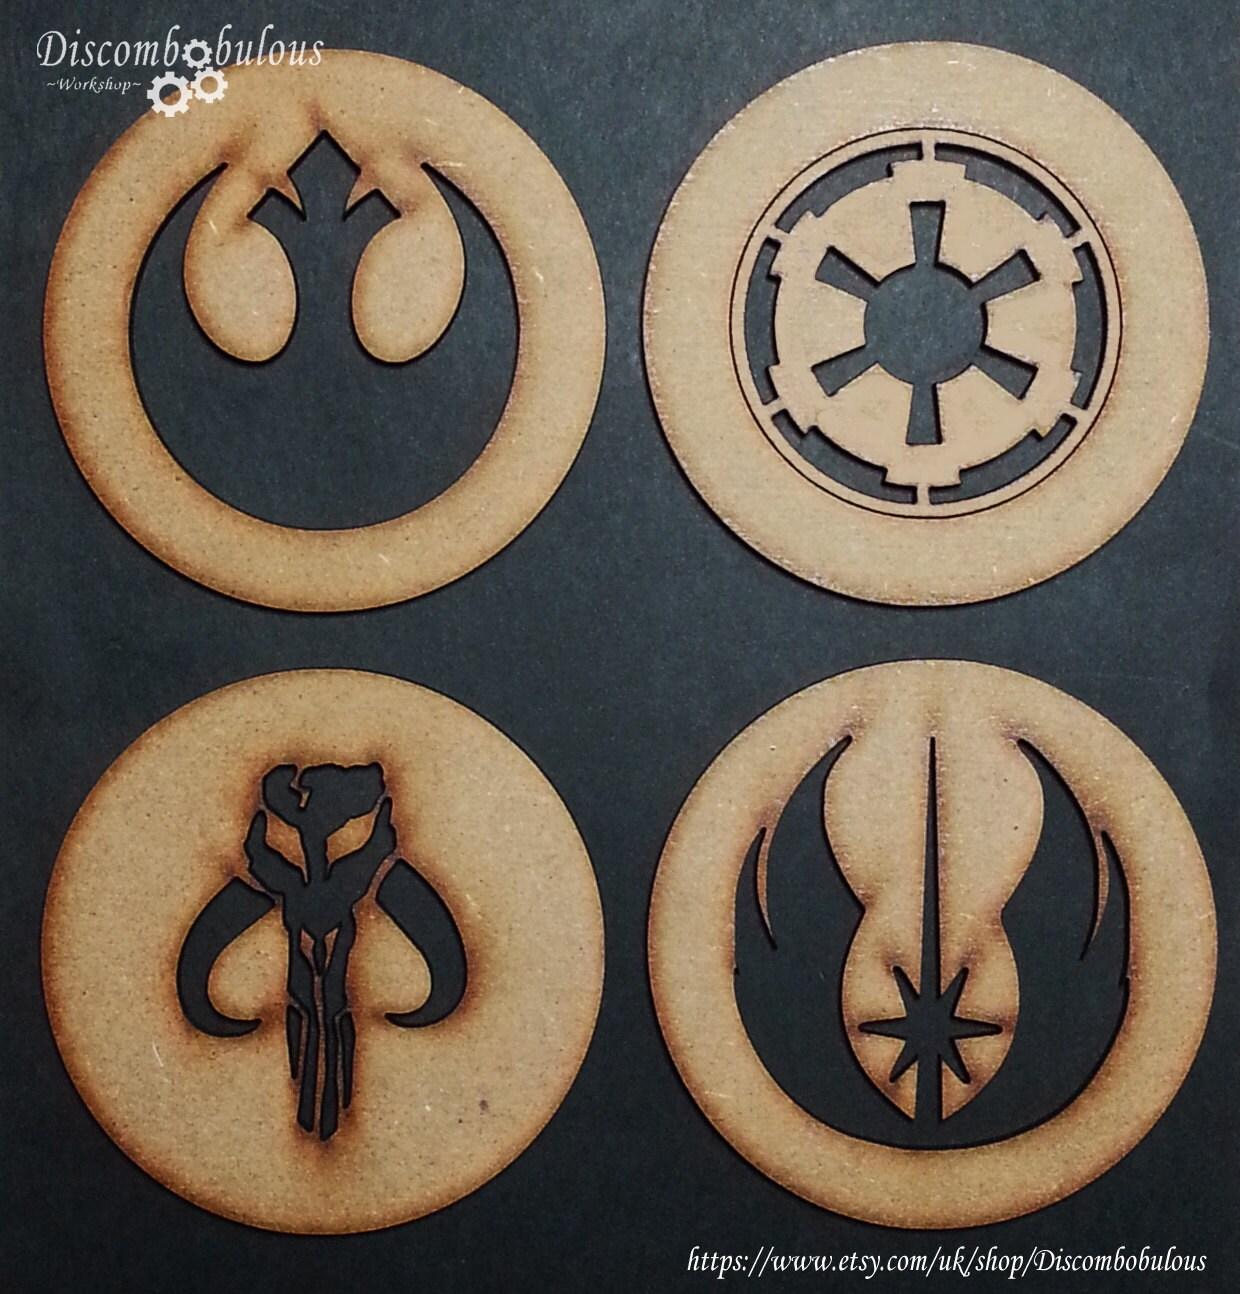 Bounty hunter star wars symbol sabine wren starwars bounty hunter star wars symbol buycottarizona Image collections